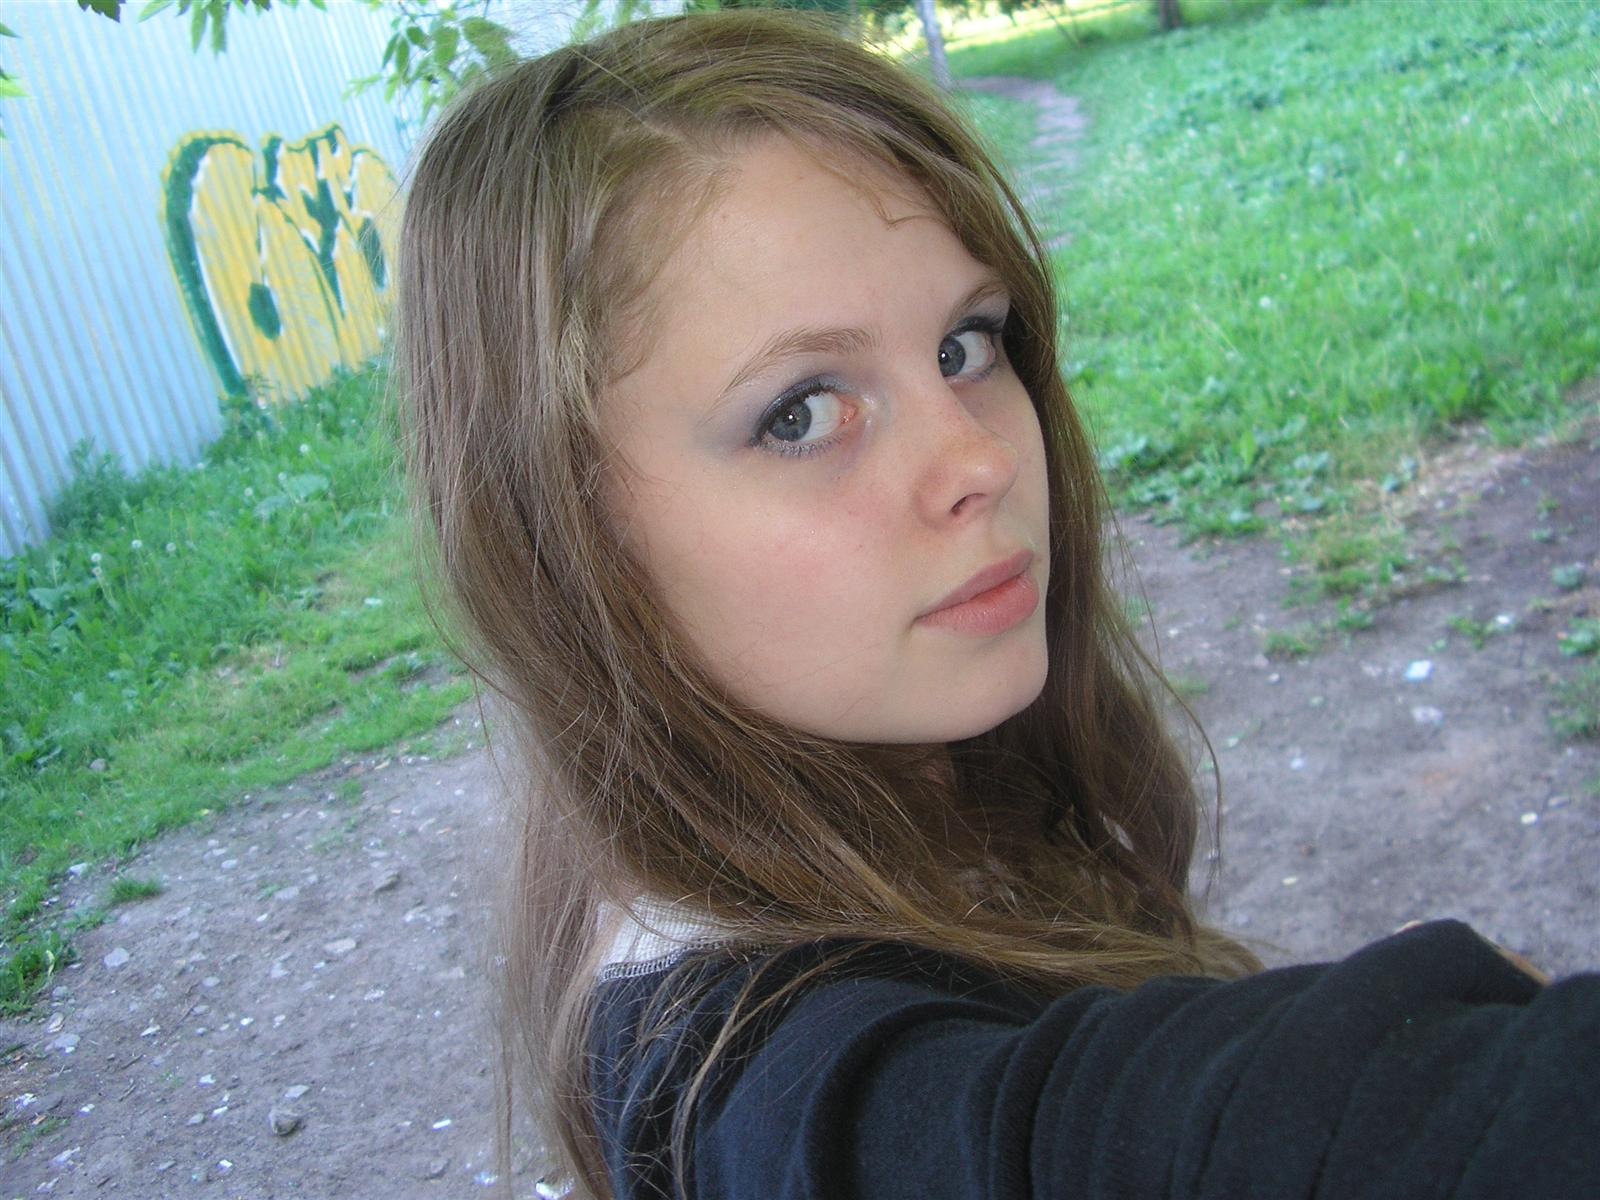 Фото из контакта девушки 12 фотография